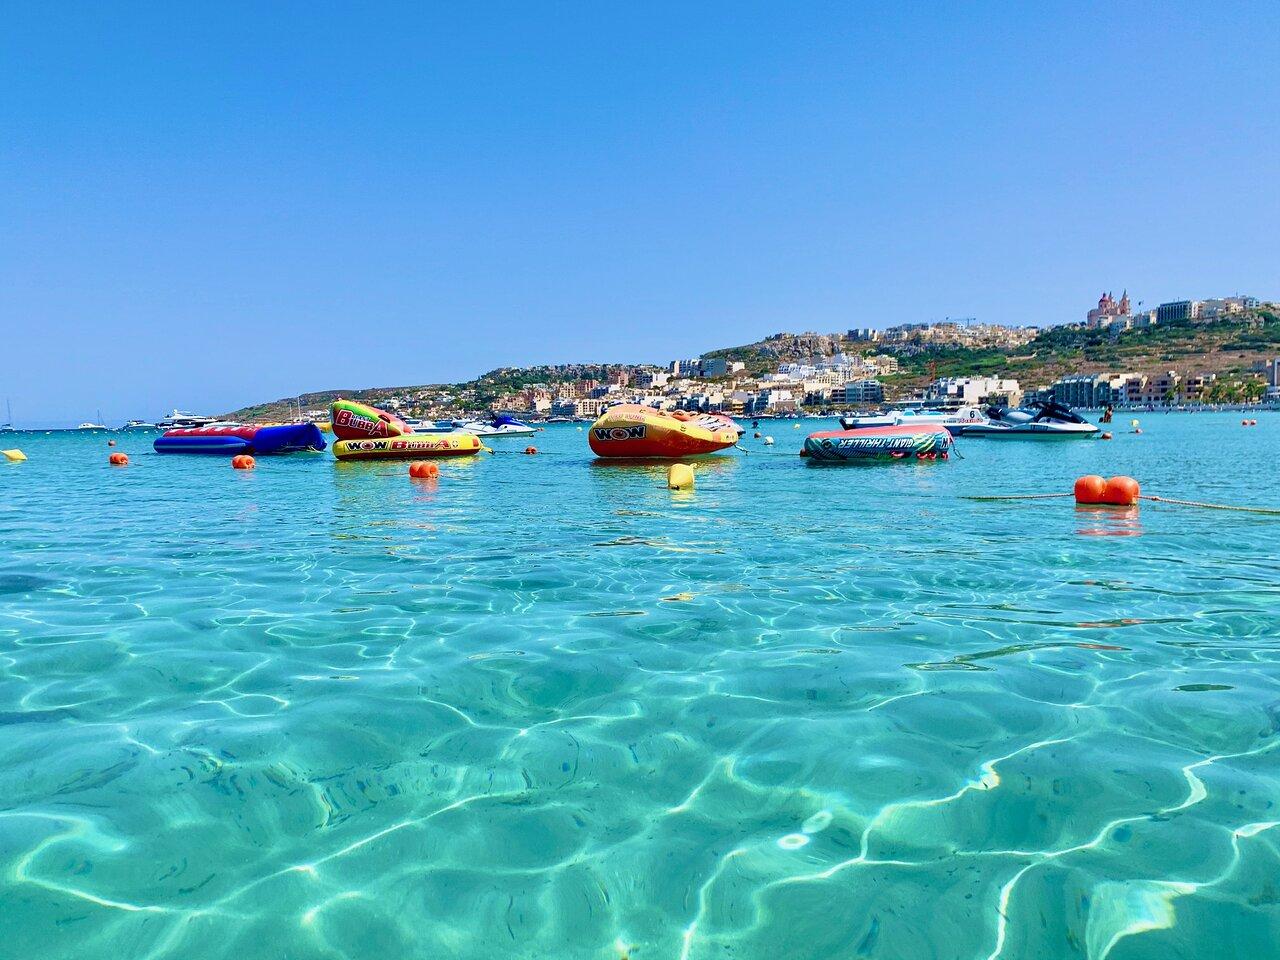 Spiaggia di Ghadira - Picture of Ghadira Bay, Island of Malta - Tripadvisor